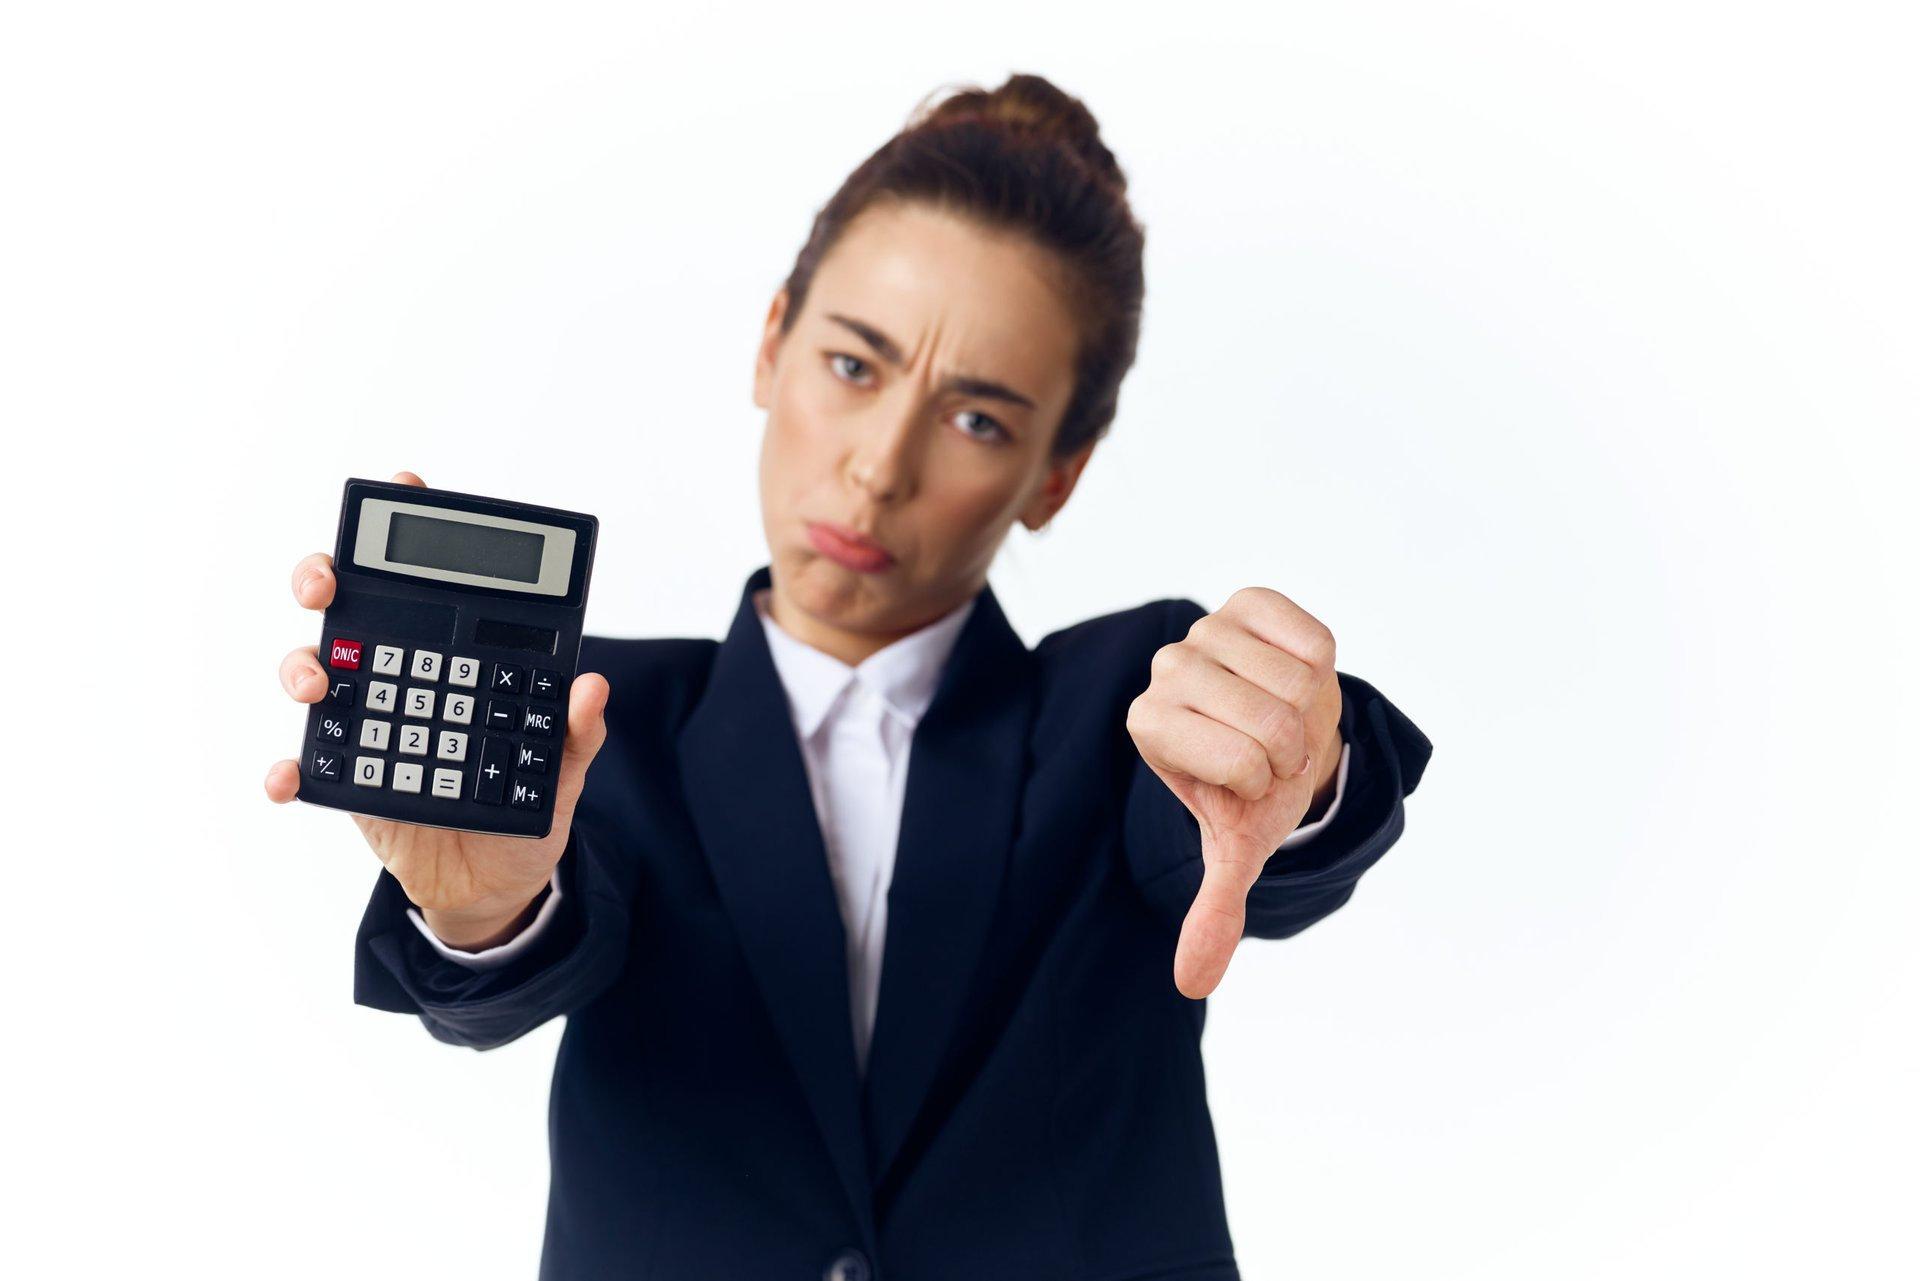 Rich woman holding a calculator